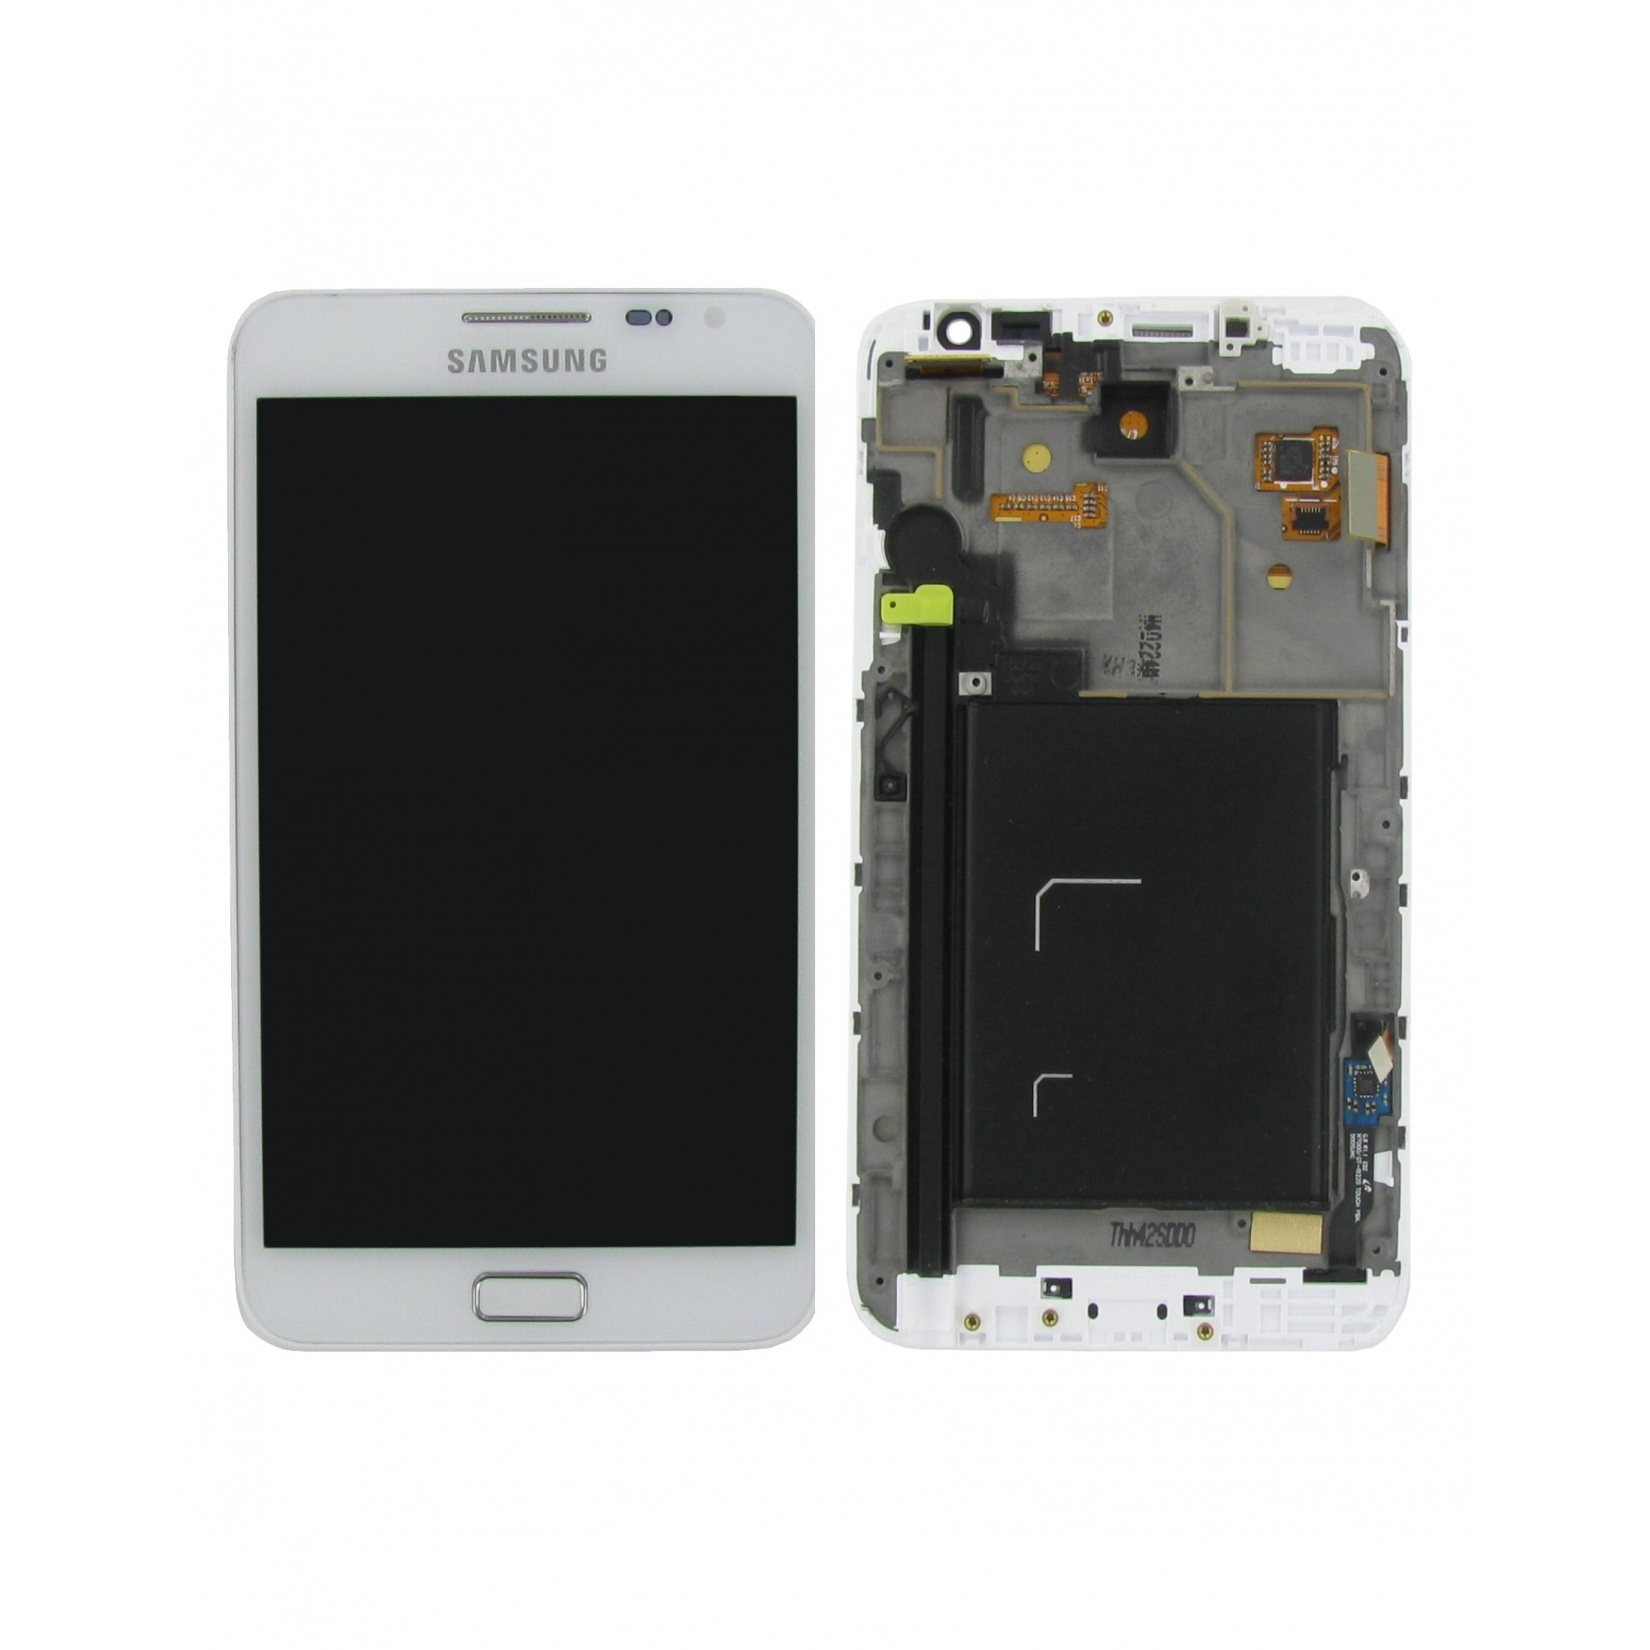 Original Samsung Galaxy Note N7000 Display Lcd Rahmen 11999 Pro 122 P901